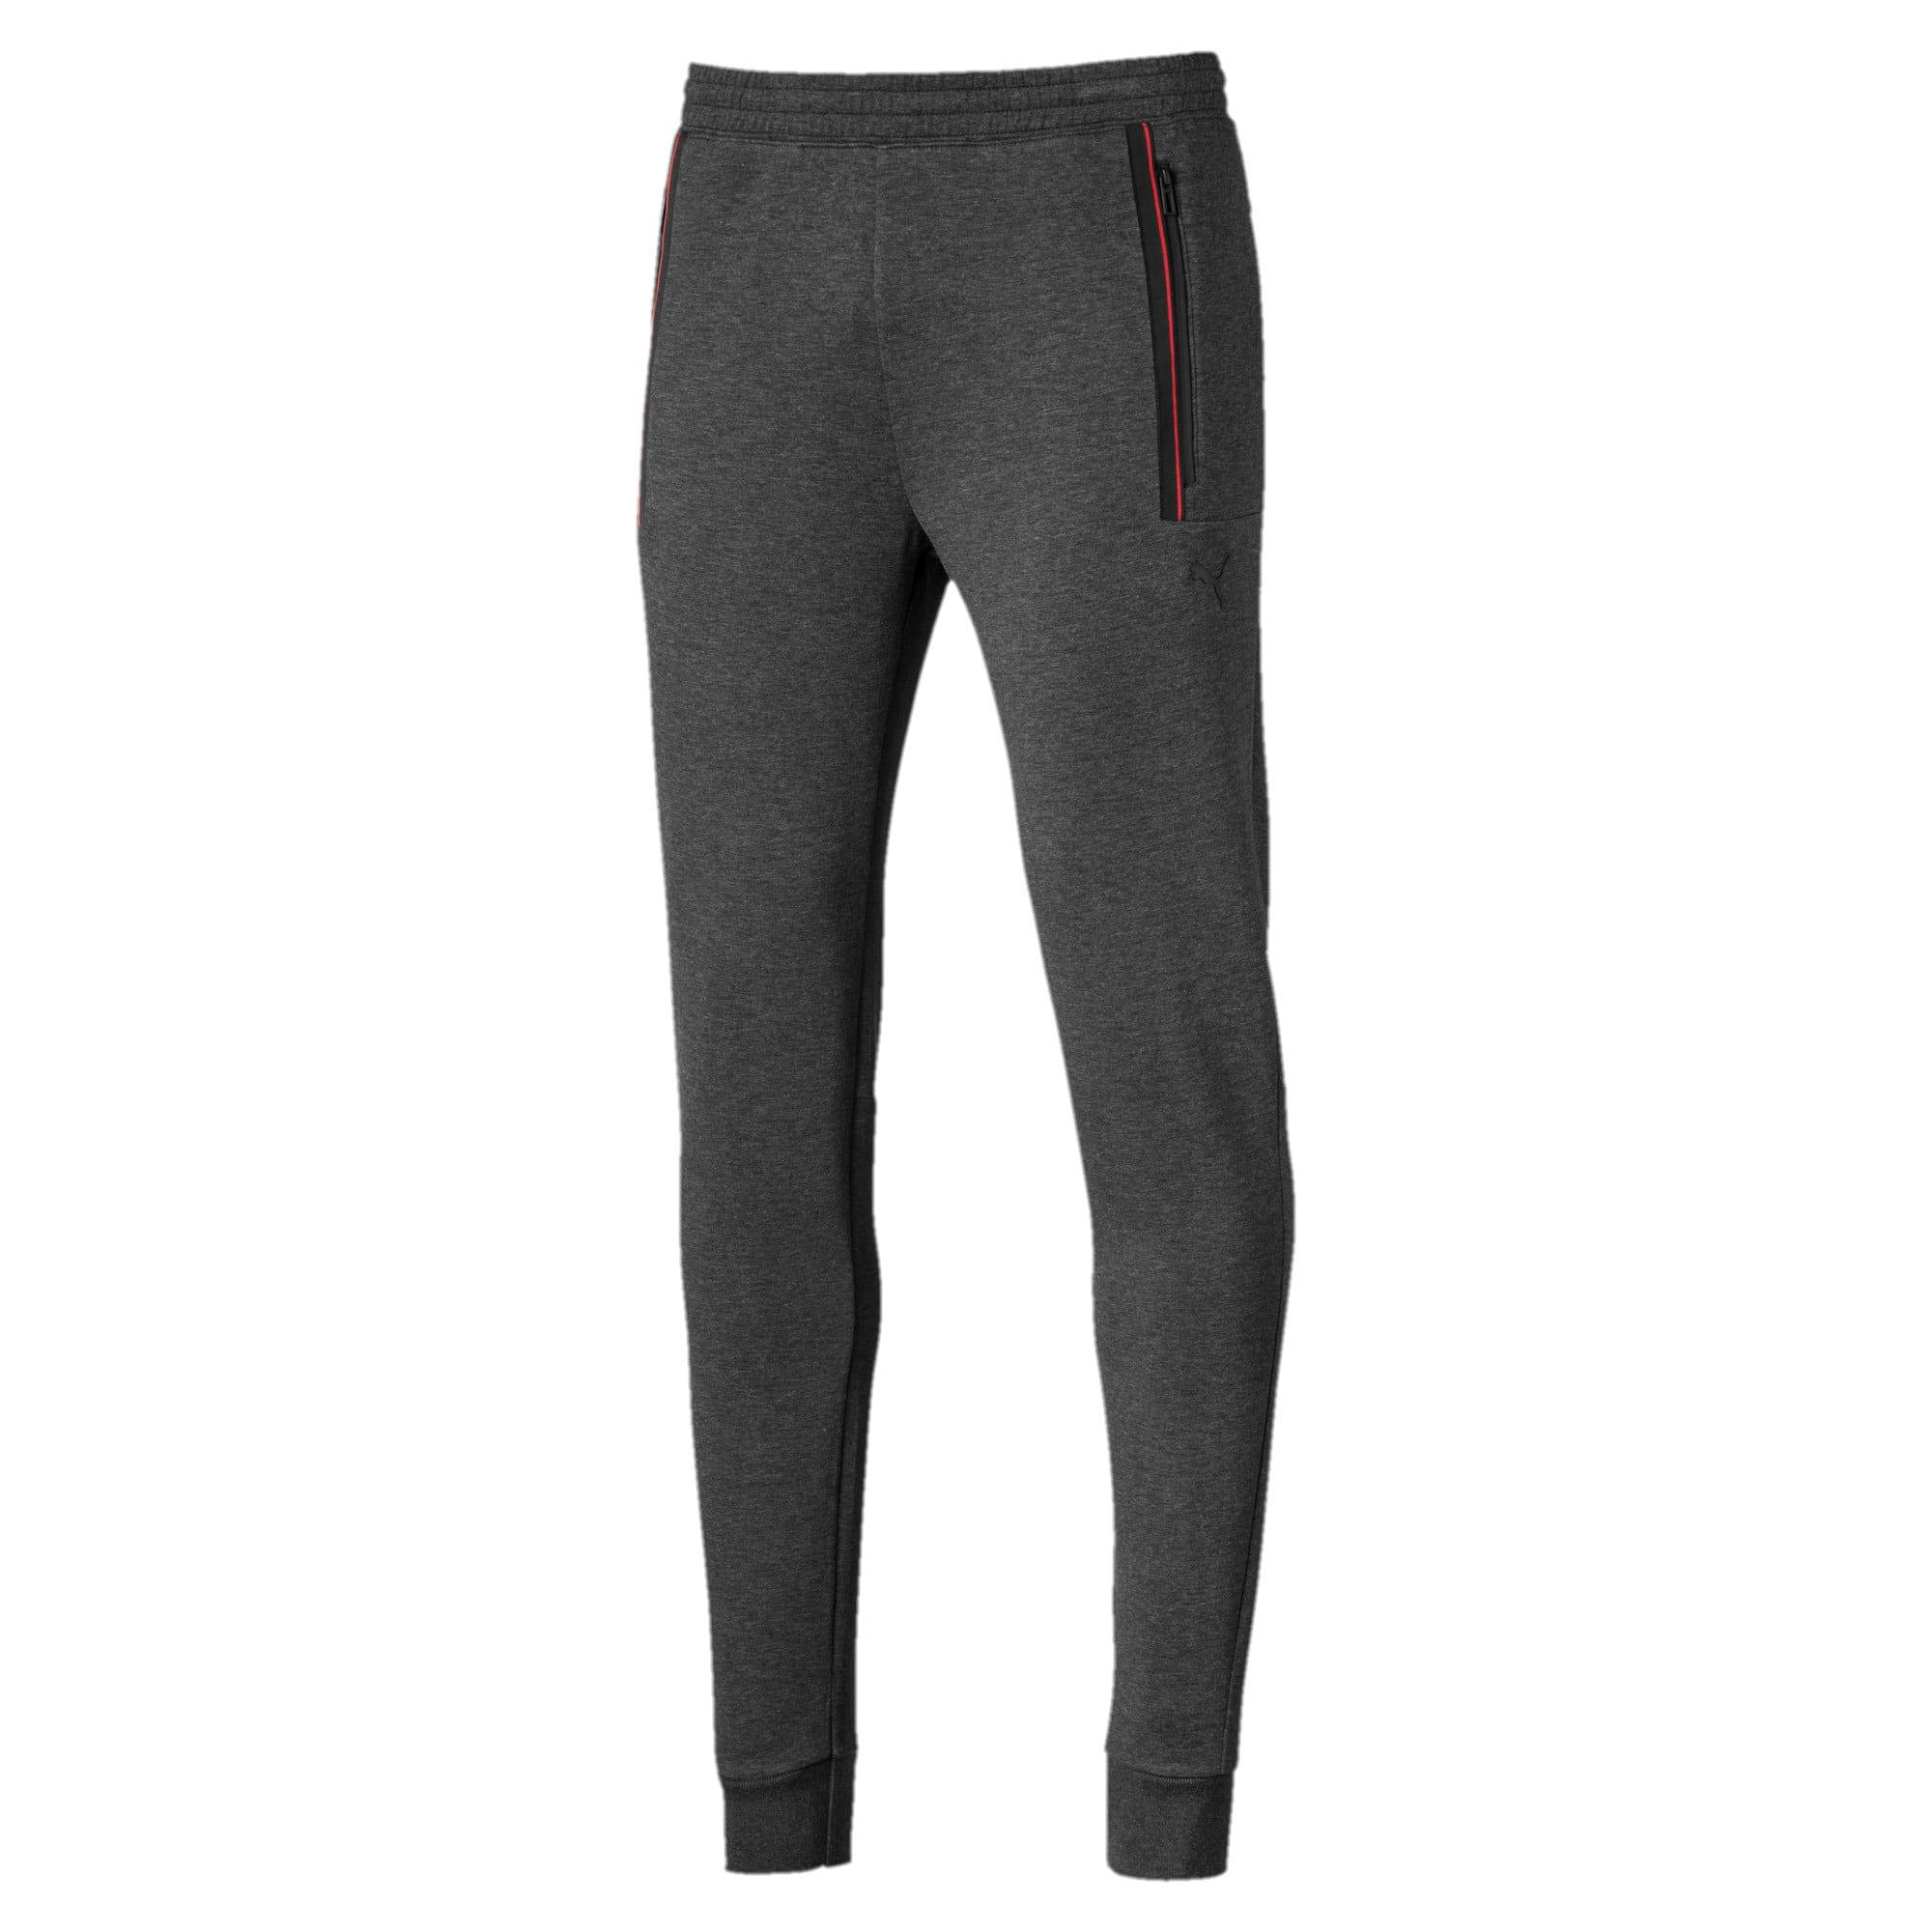 Miniatura 1 de Pantalones deportivos Ferrari para hombre, Dark Gray Heather, mediano